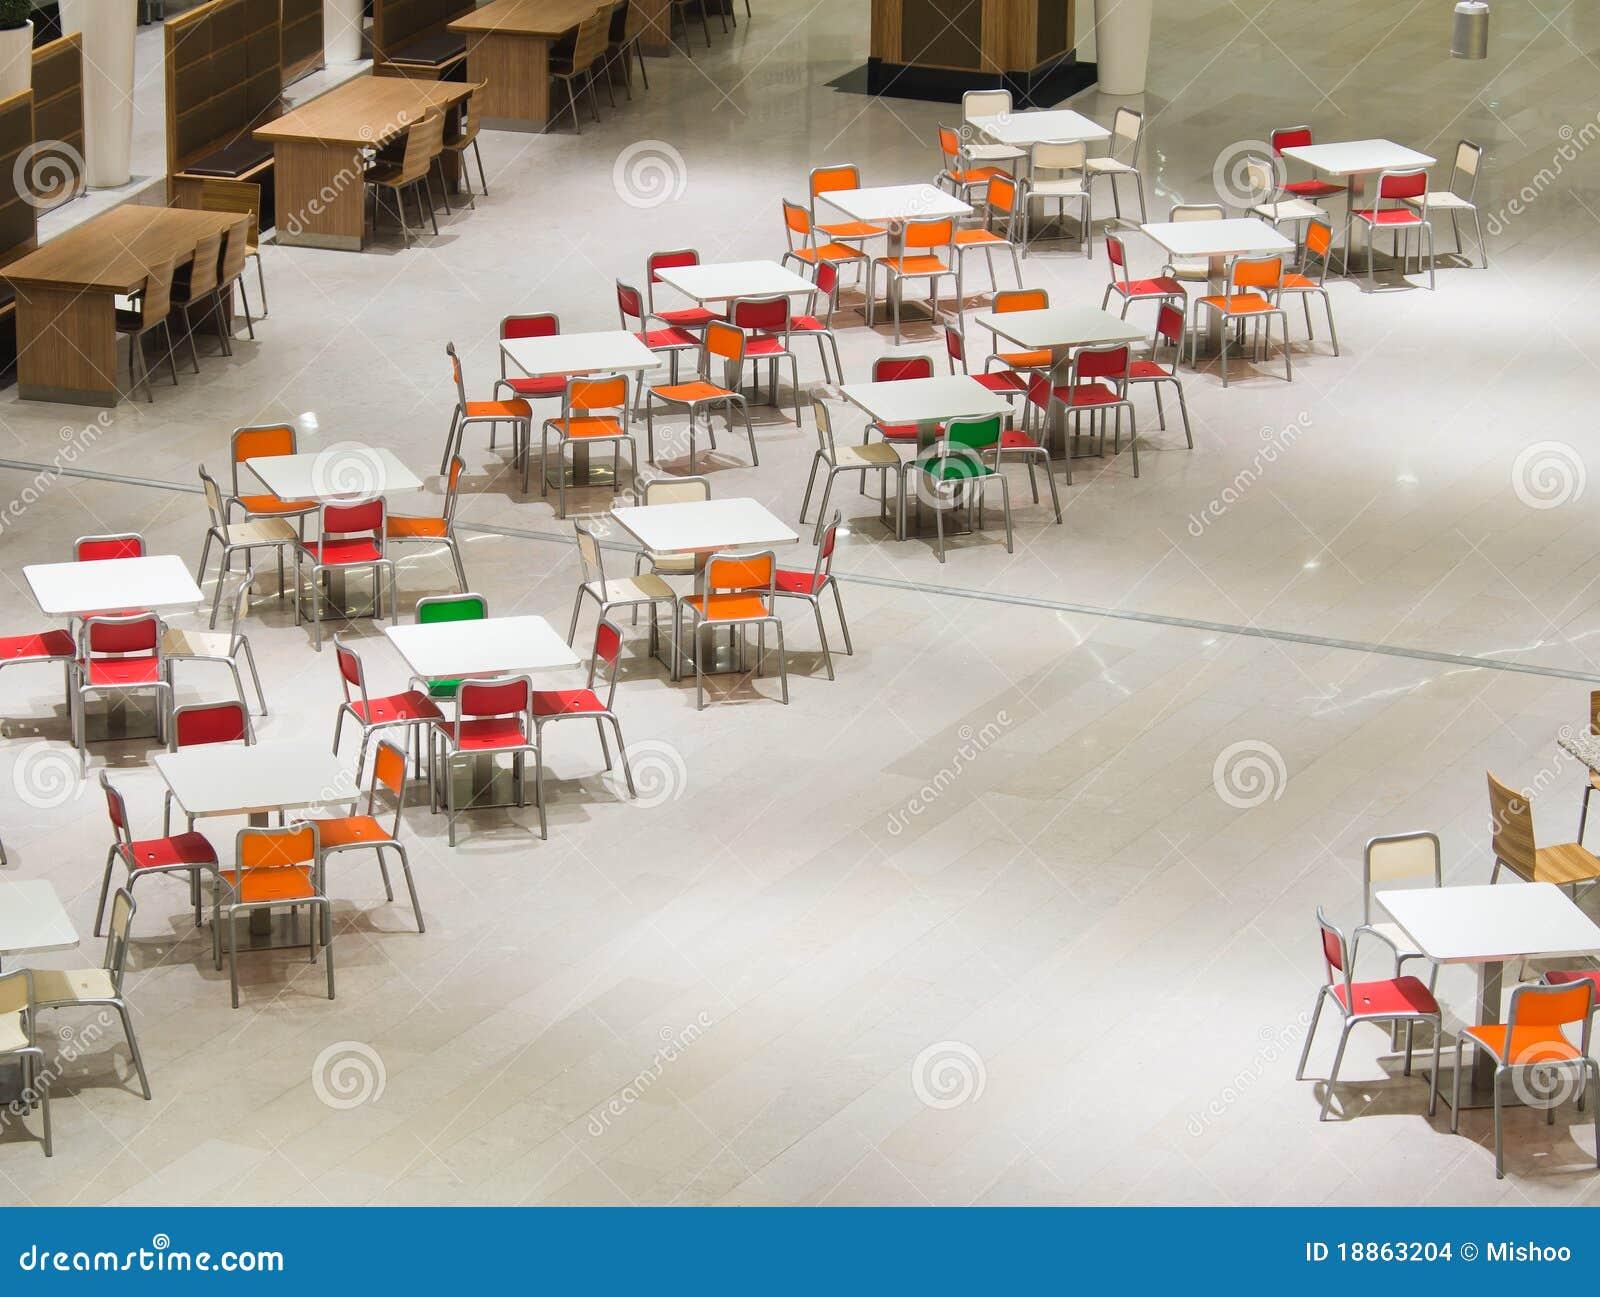 Fast-food tables